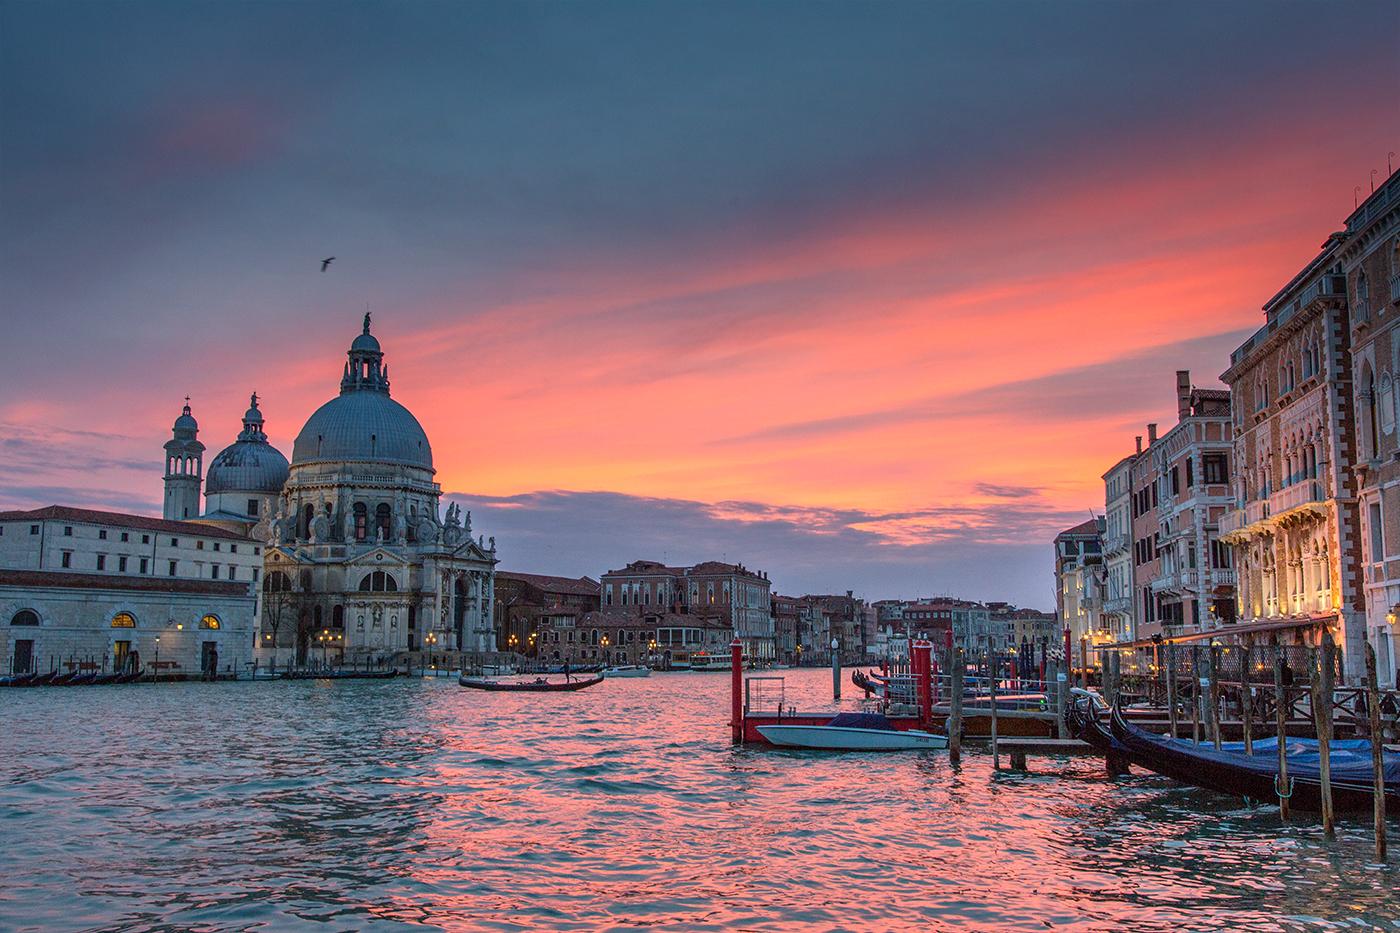 BPIC_POTYR2_Venice-Sunset_DWright_Novice.jpg